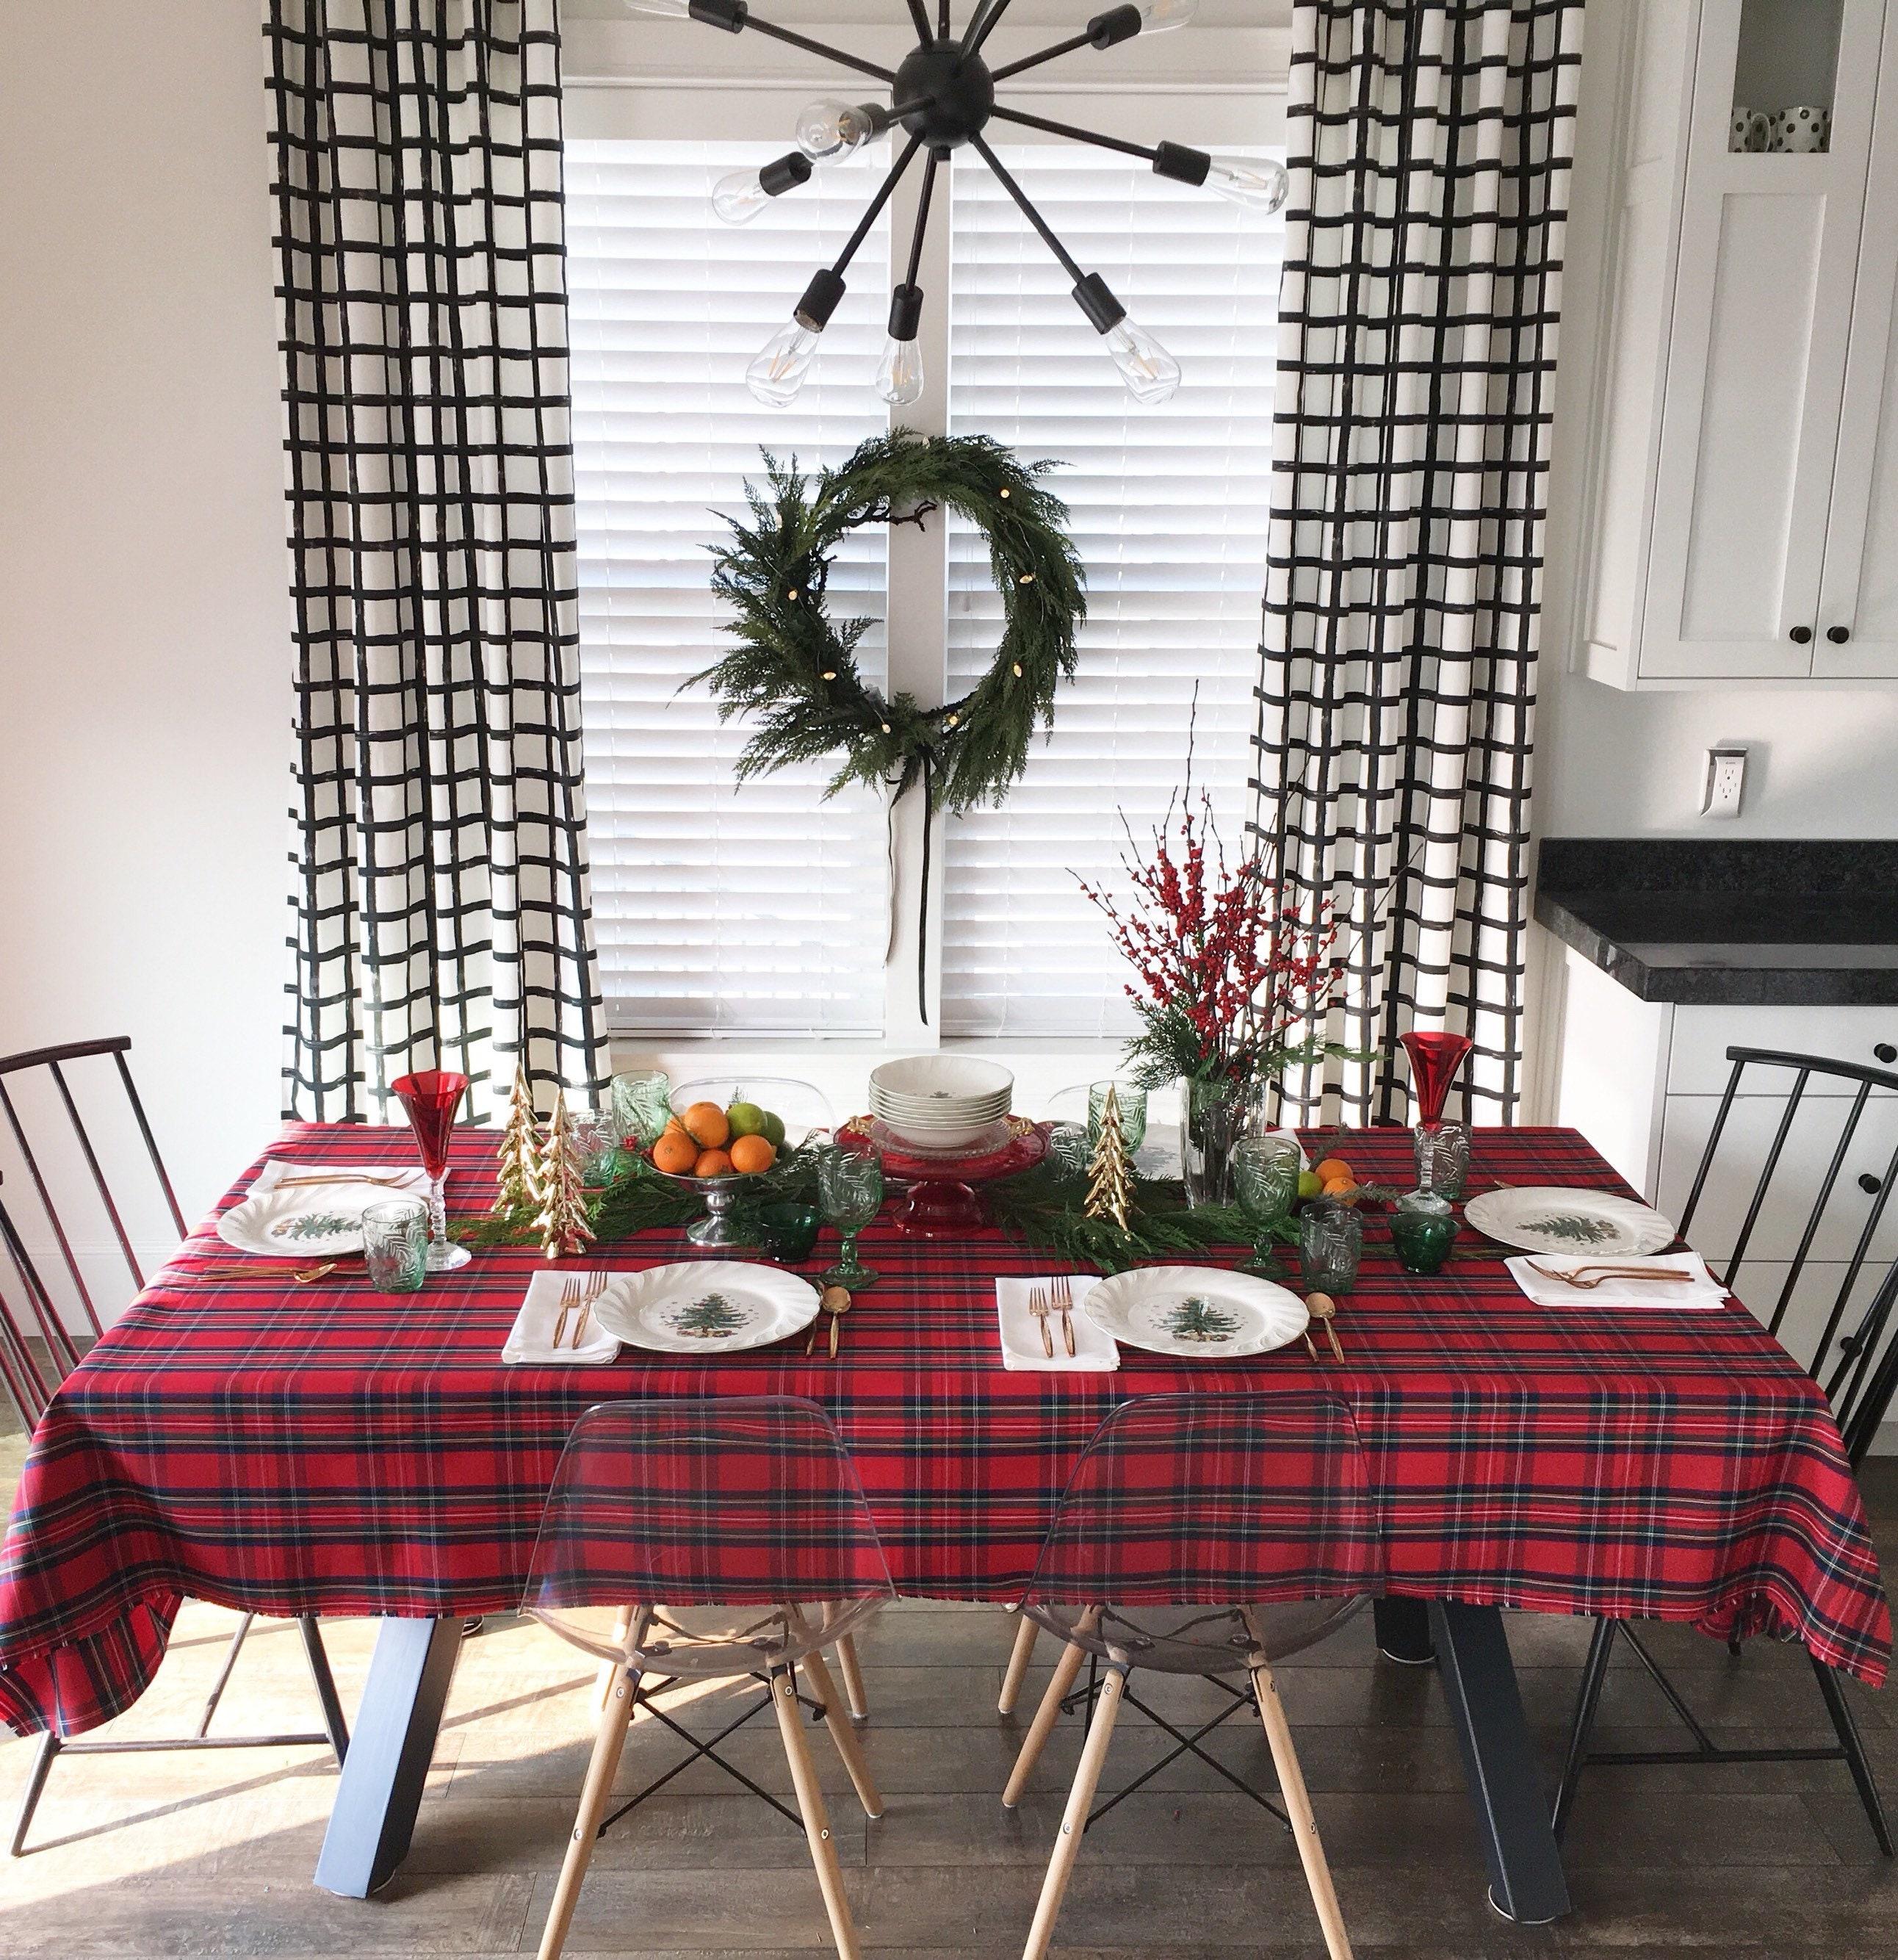 Red Tartan Tablecloth | Scottish Plaid Table Linens, Royal ...